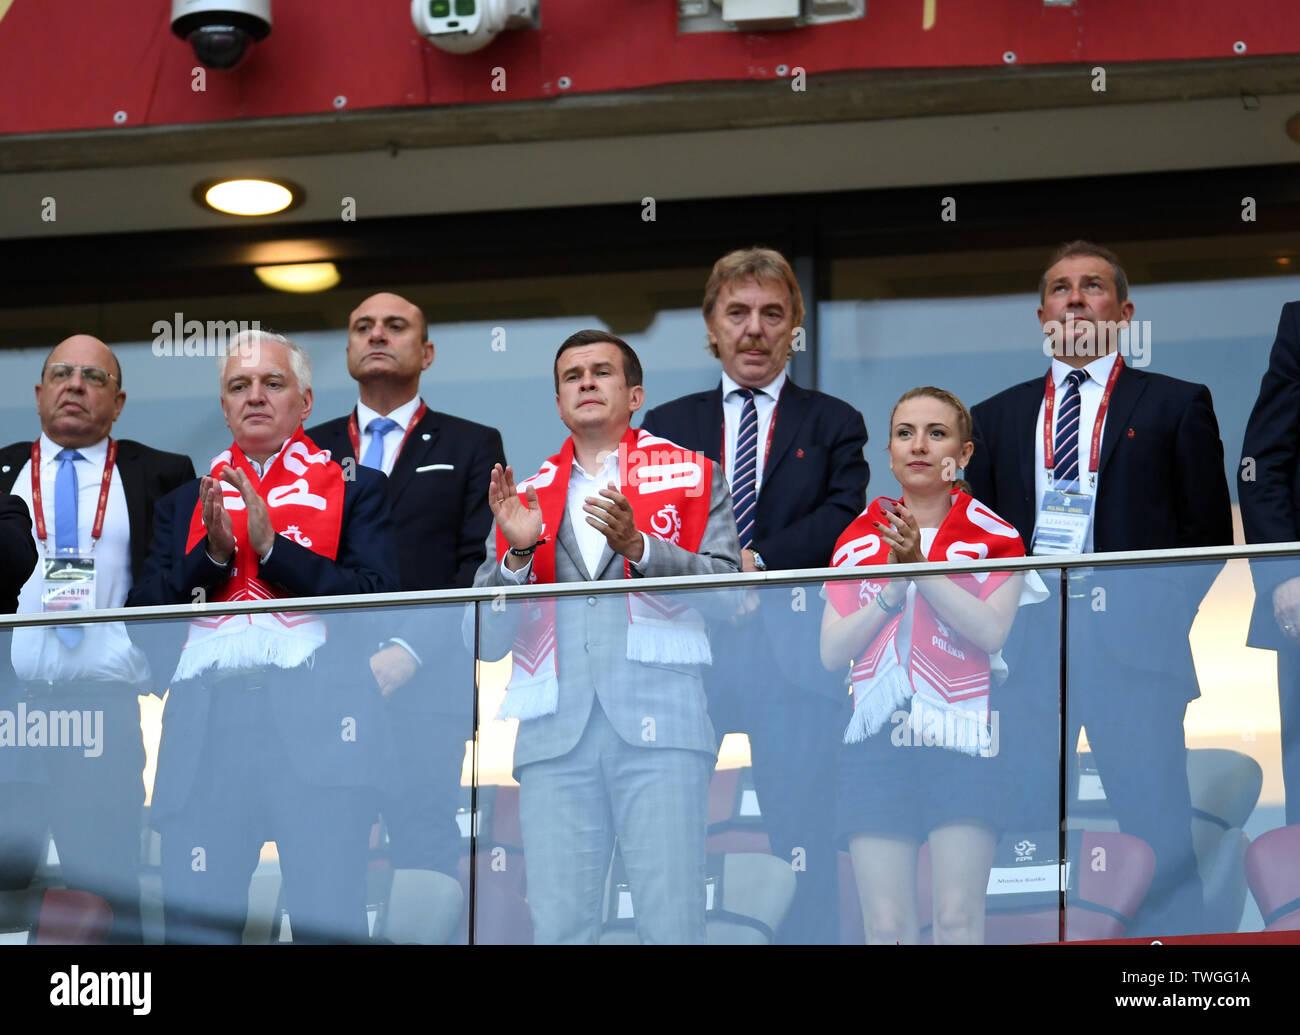 Warsaw, Poland, June 10, 2019: EURO 2020 qualifing round, group stage, Poland wins 4:0 with Izarel on PGE Narodowy. Jaroslaw Gowin, Witold Banka, Zbigniew Boniek - Stock Image